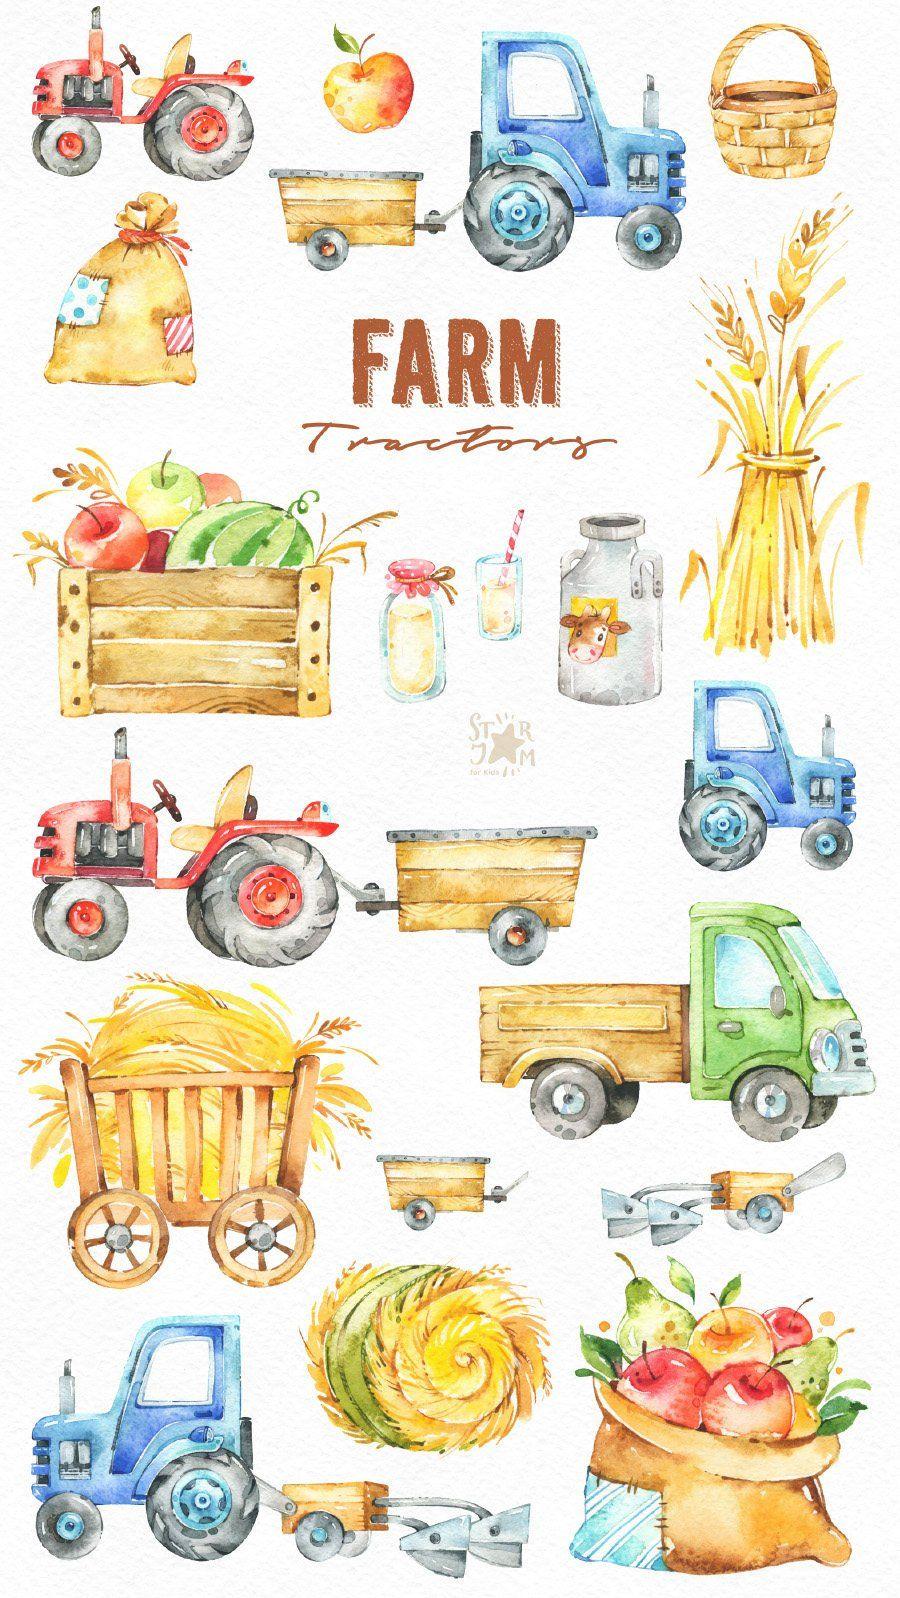 Farm Tractors Watercolor Clipart Fruits Household Harvest